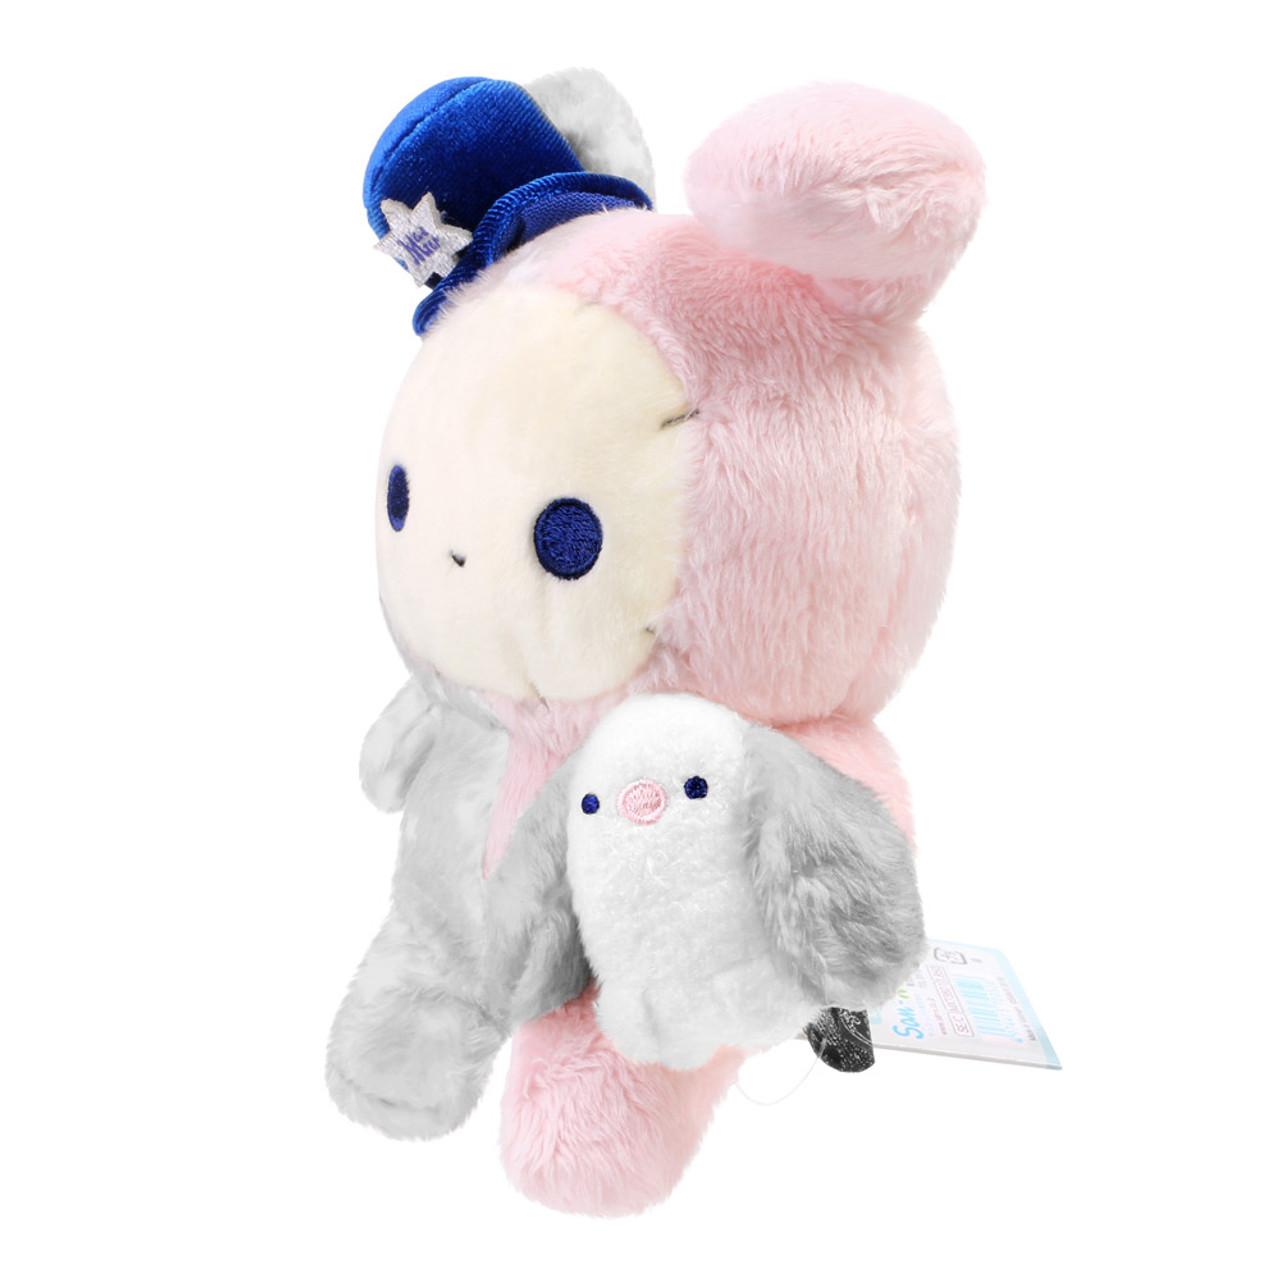 Sentimental Circus Plush Doll - Spica & PoPo ( Side View )